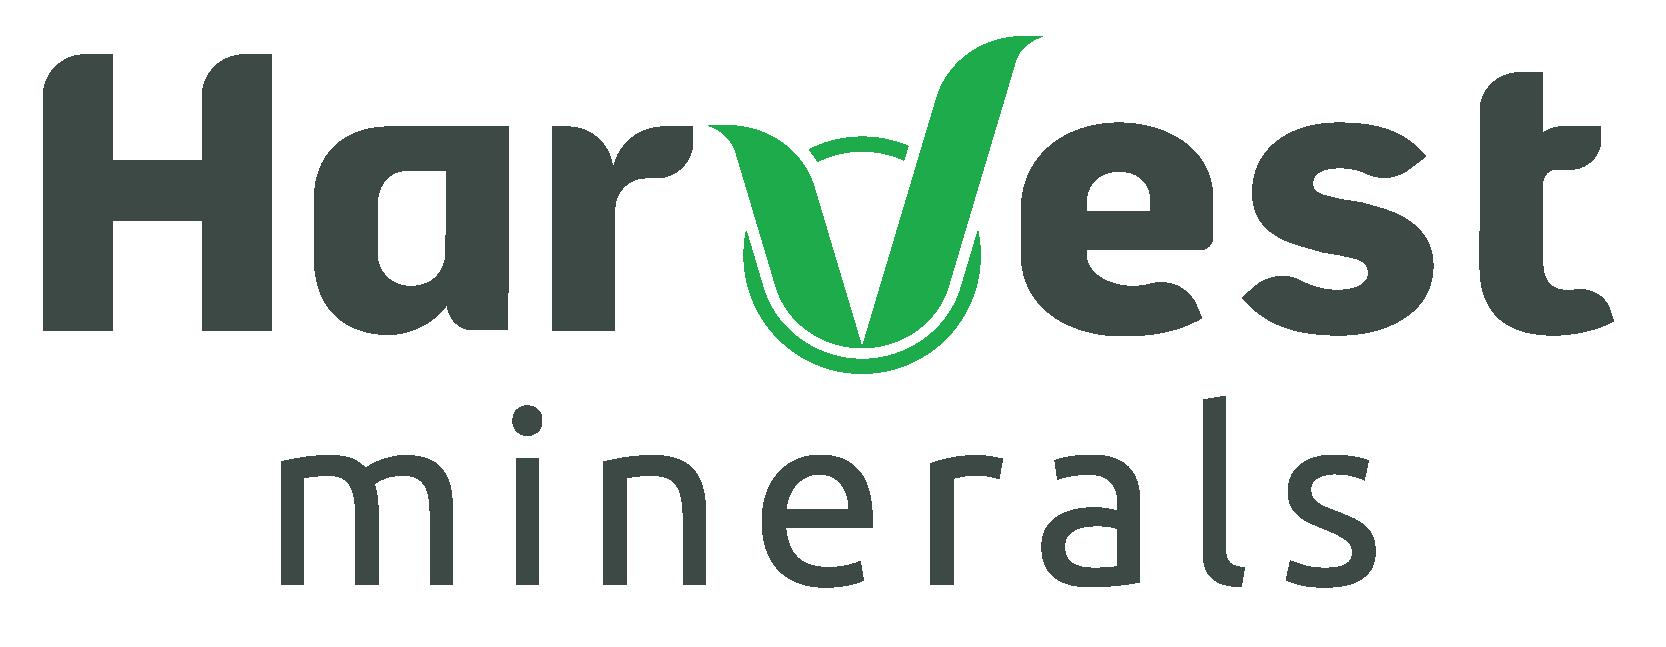 HARVEST MINERALS LIMITED Logo